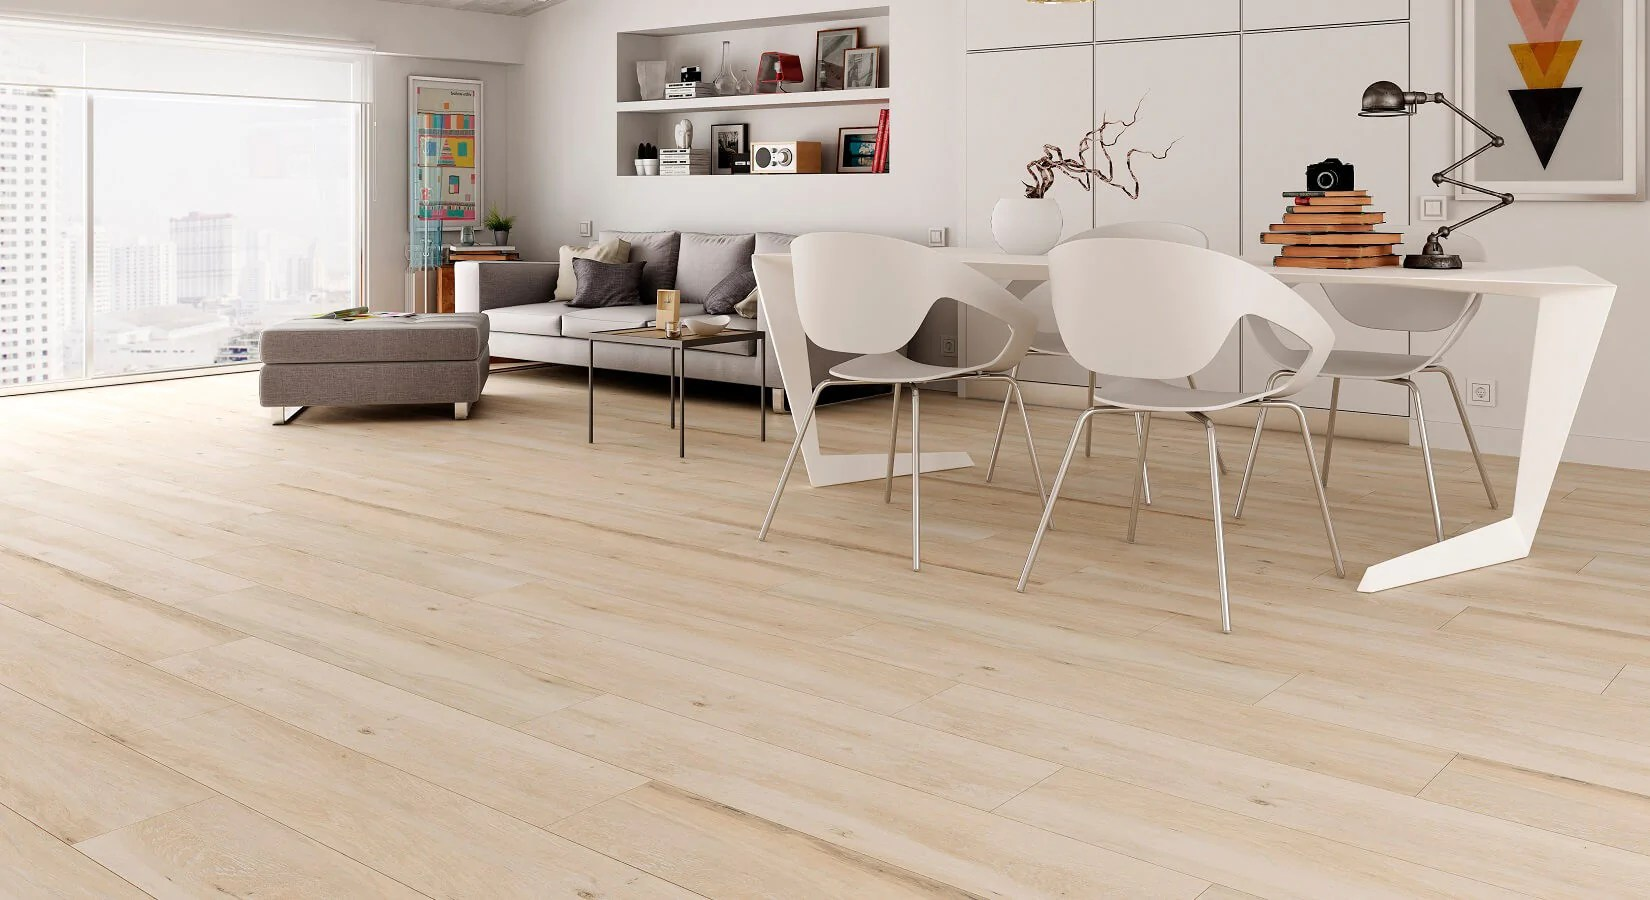 Atelier Beige Wood Effect Floor Tiles On Sale At 20 50 Per Sq M Tile Devil